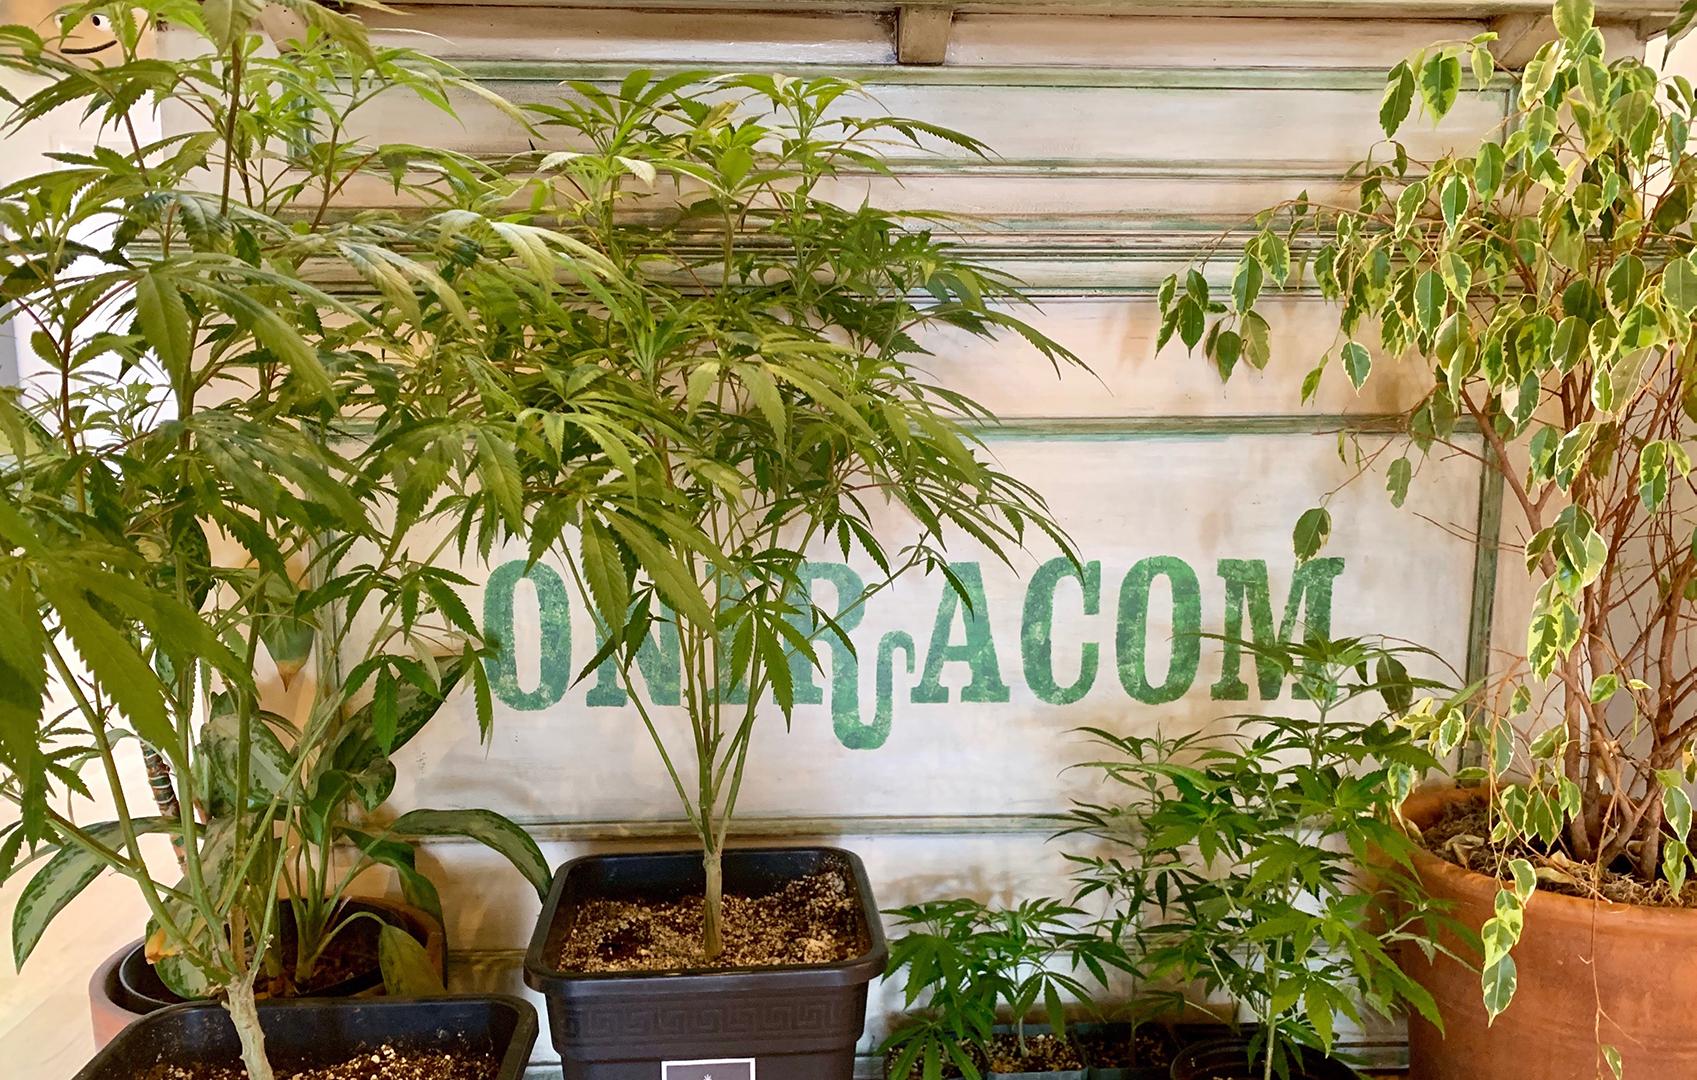 oni desk weed plants.jpg